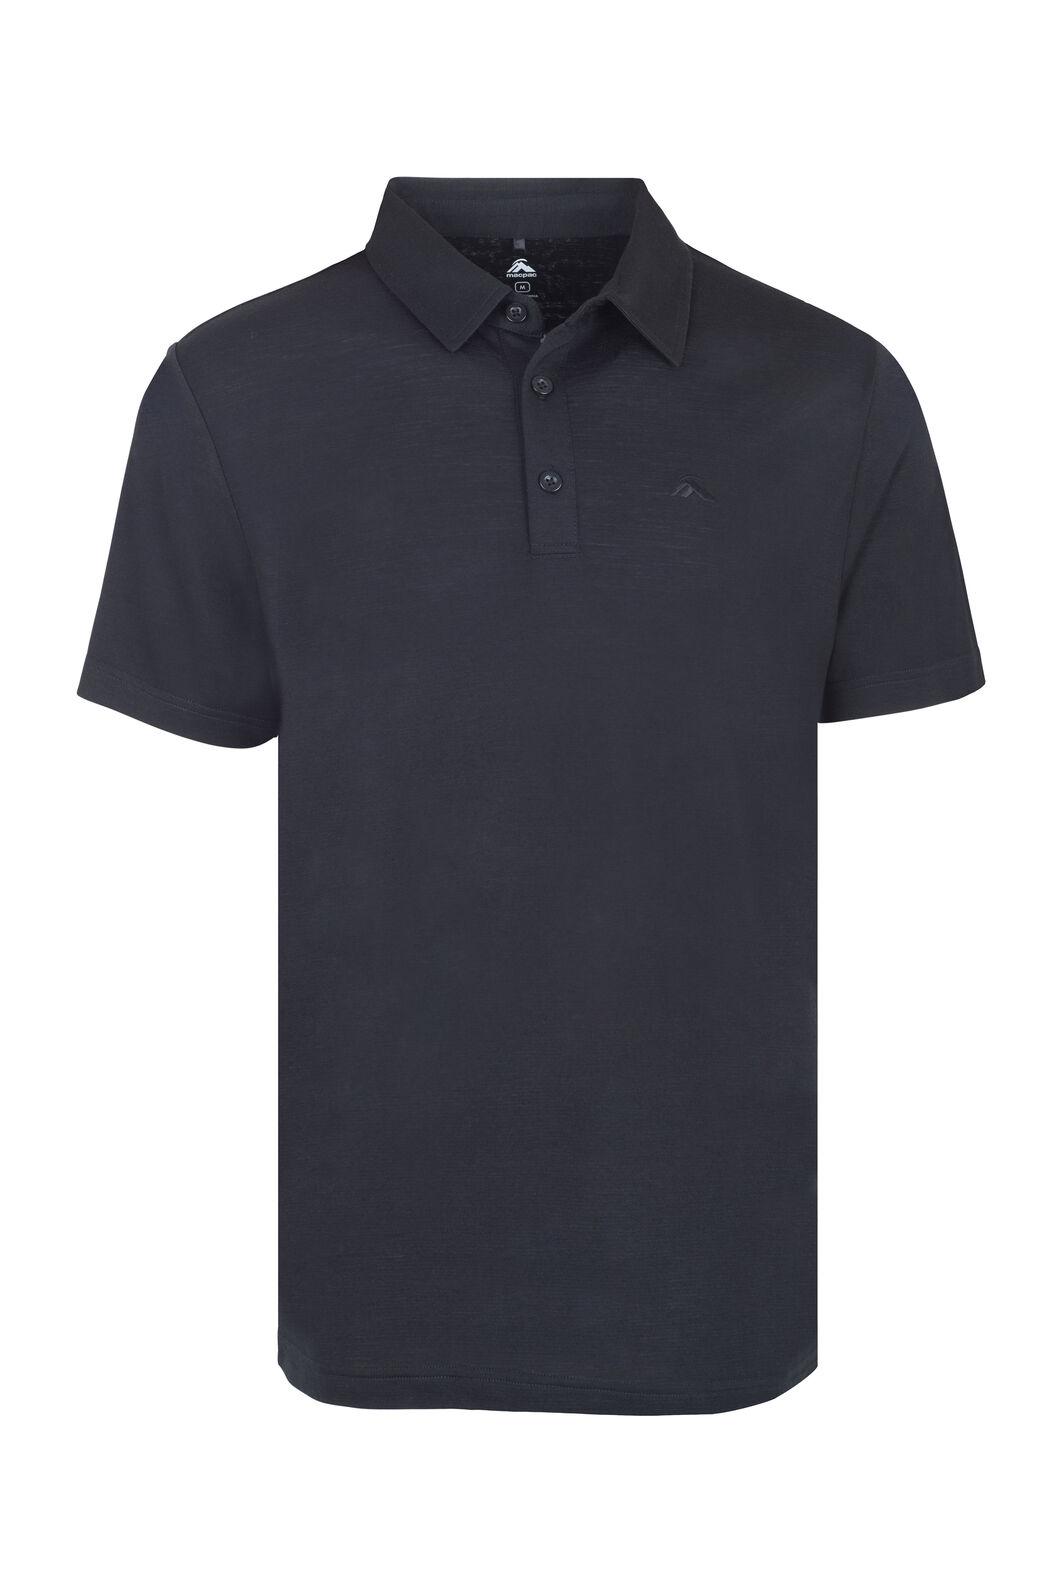 Macpac Merino Blend Short Sleeve Polo - Men's, Black, hi-res